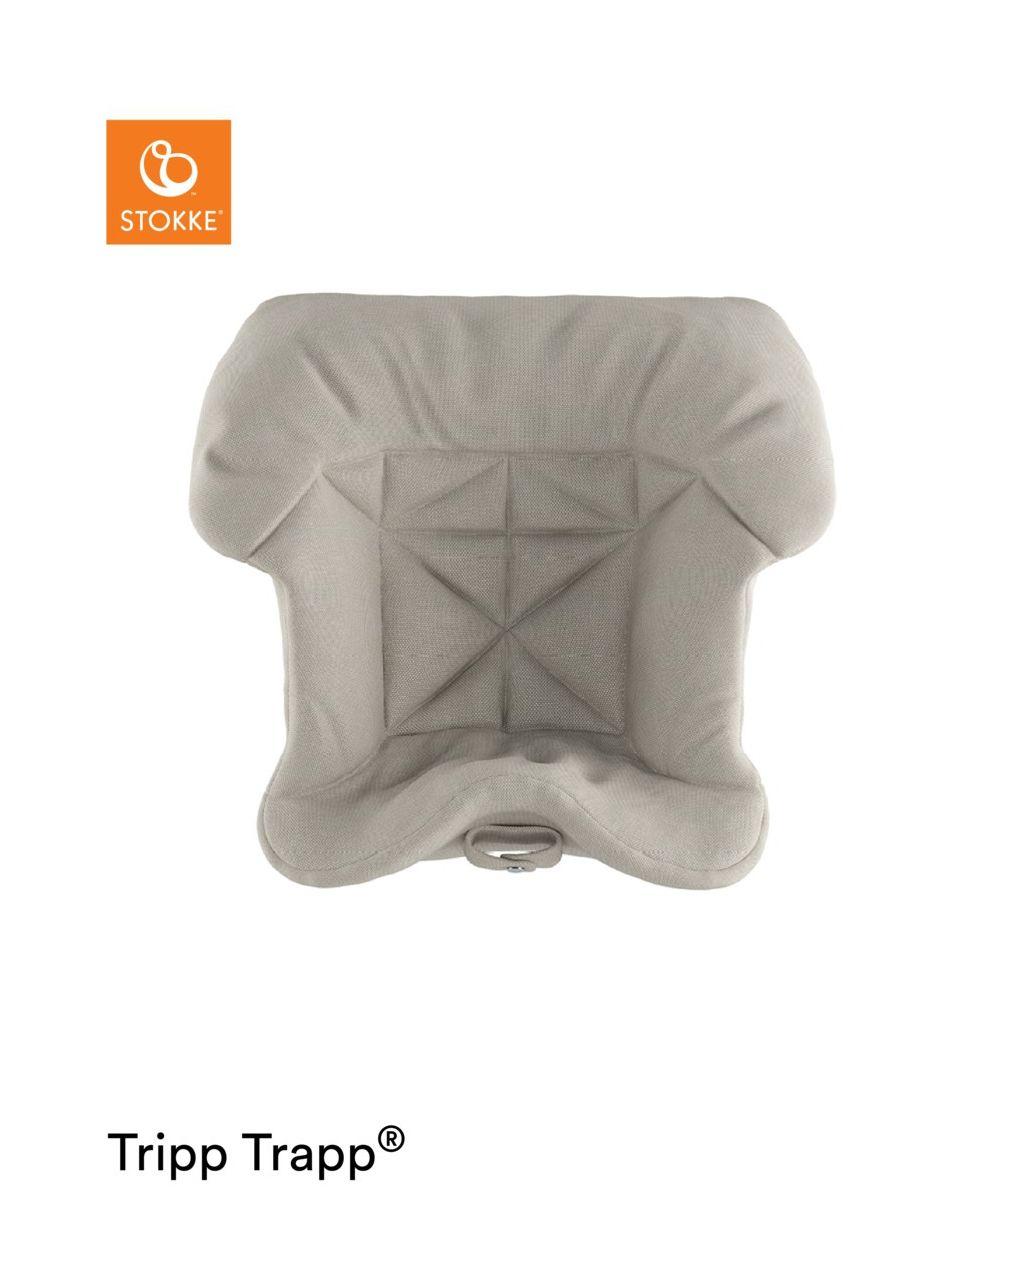 Cuscino mini tripp trapp® - timeless grey - Stokke